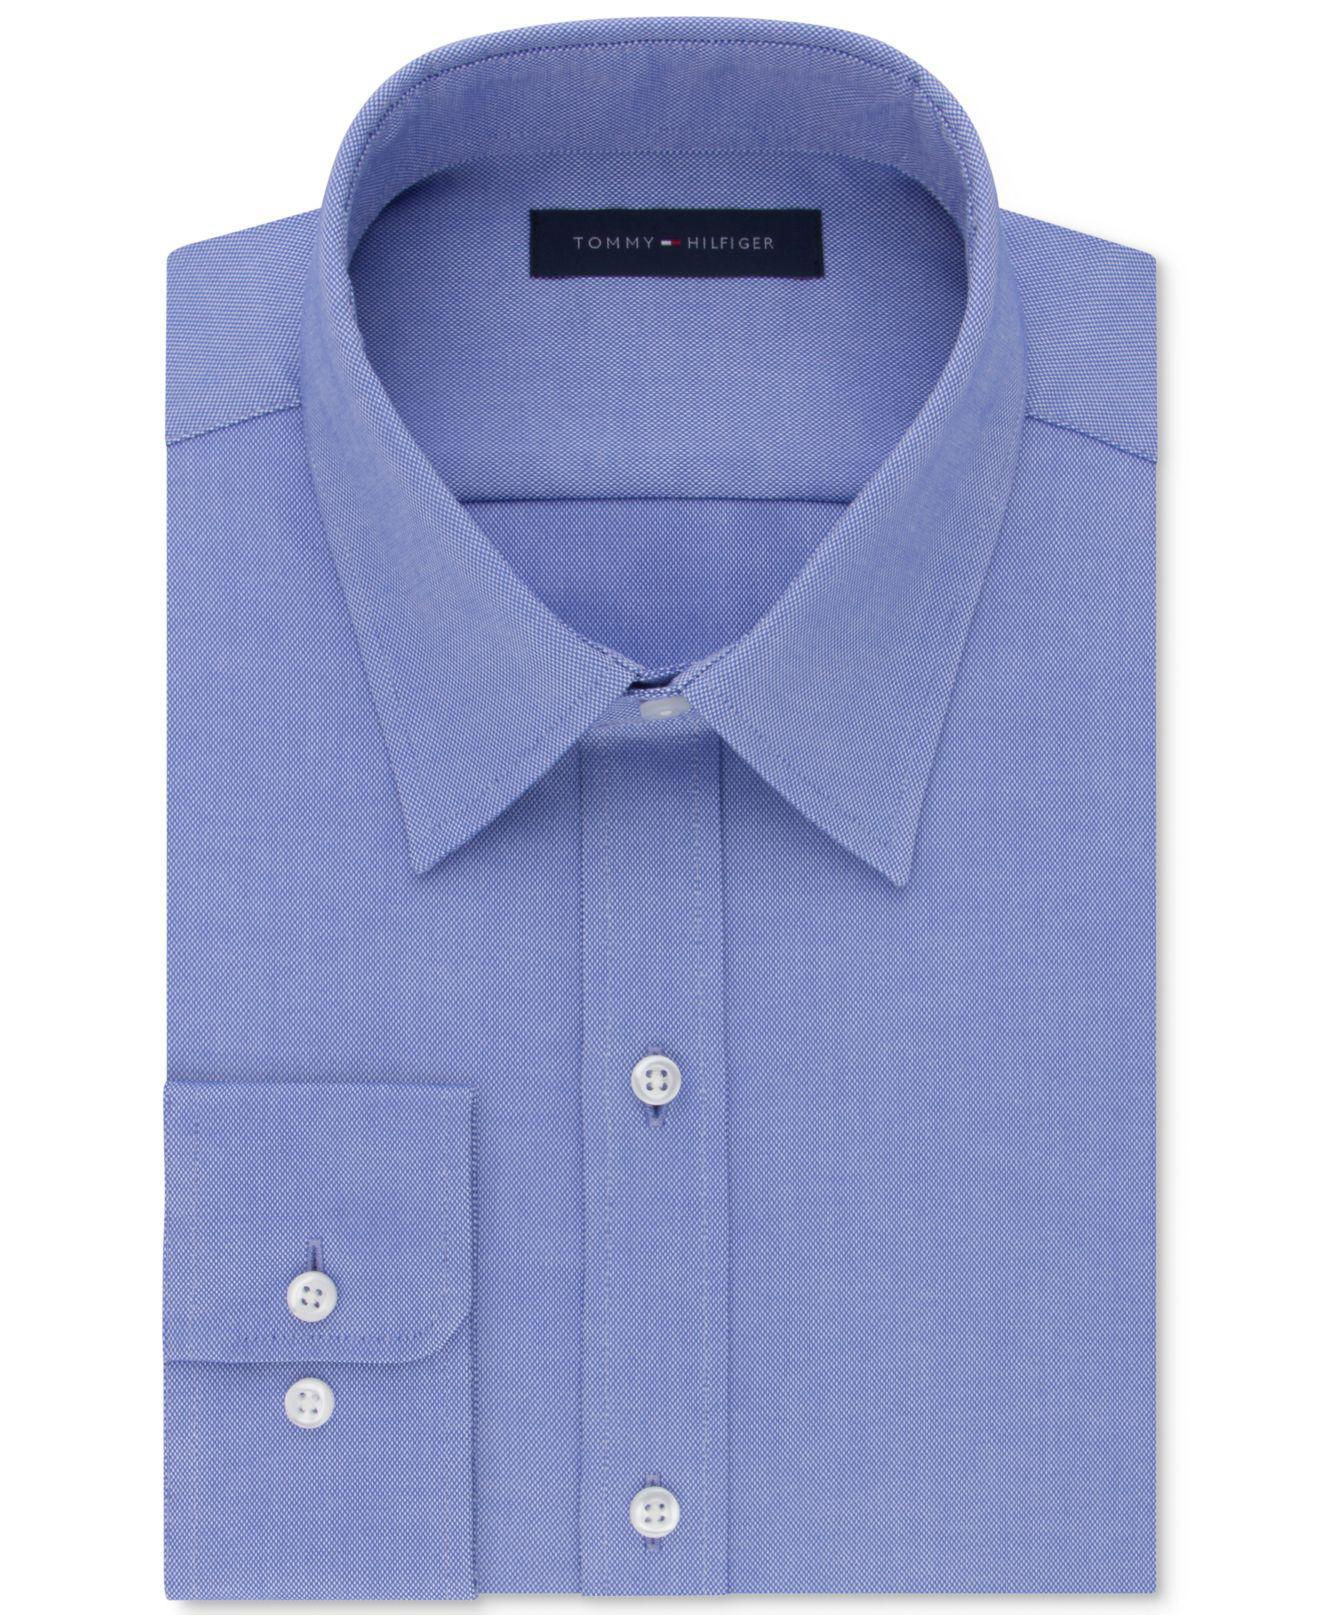 793955fff Athletic Fit Dress Shirts Macys - DREAMWORKS